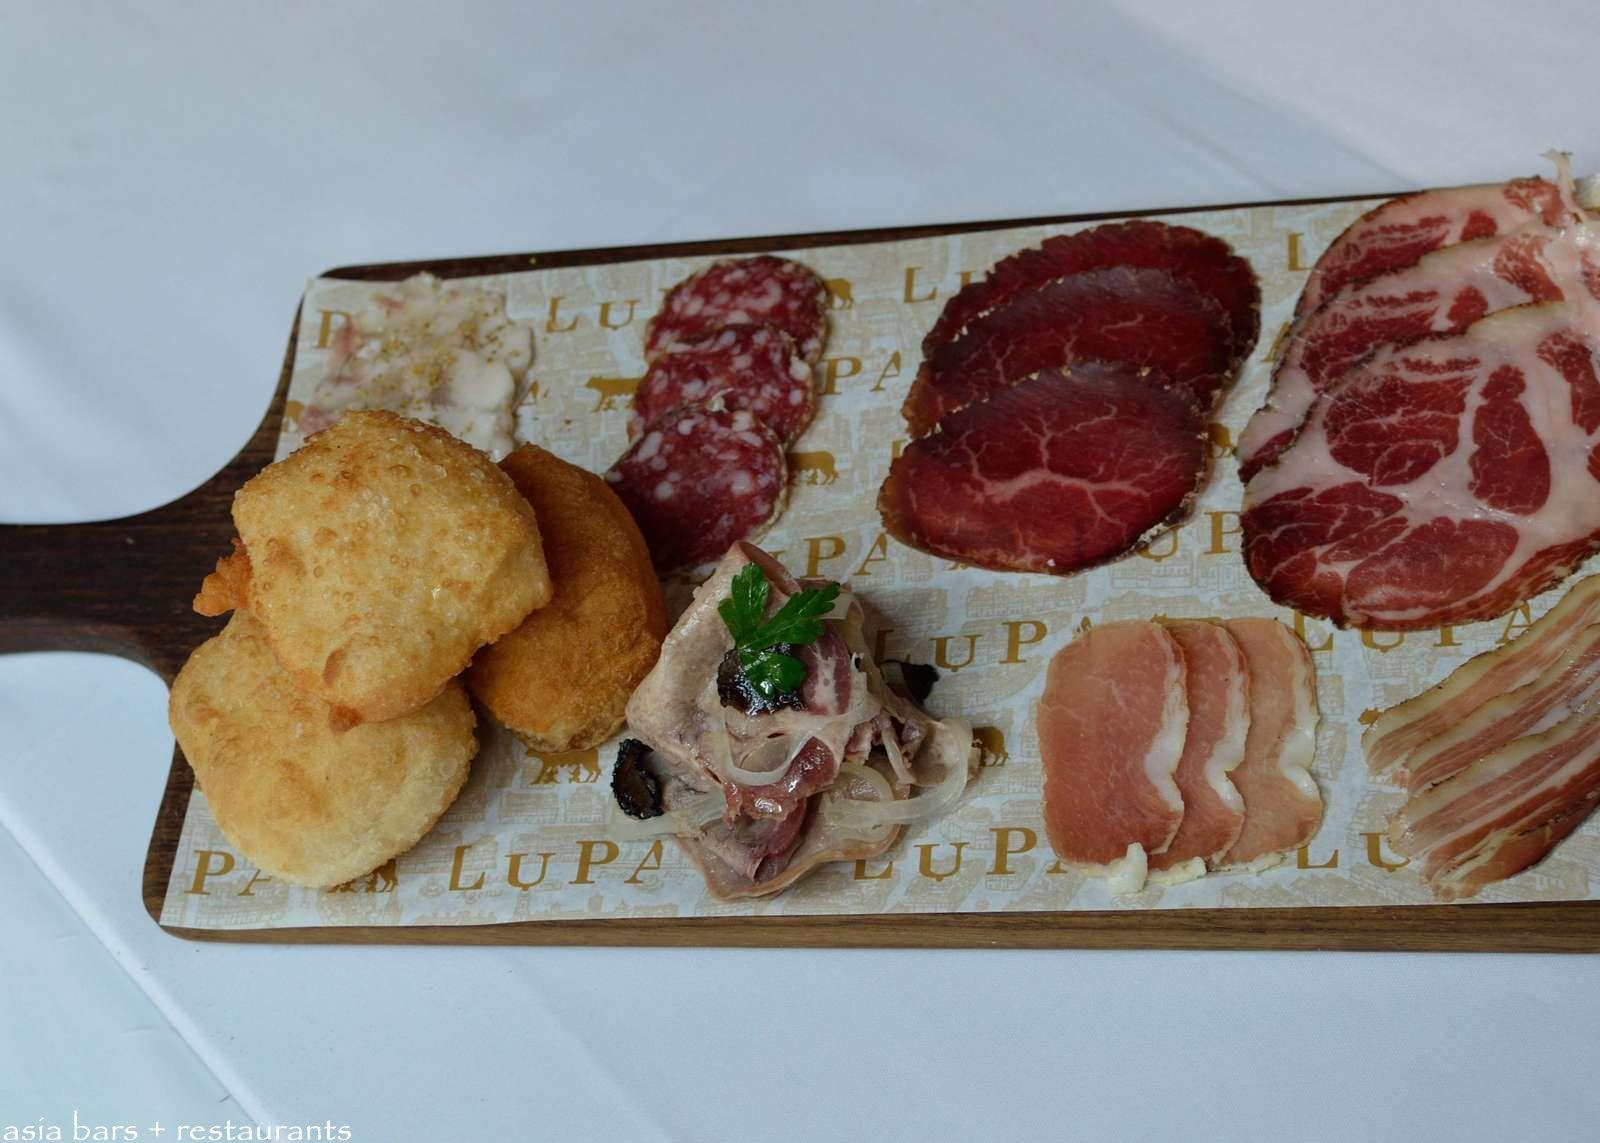 Lupa Italian Restaurant